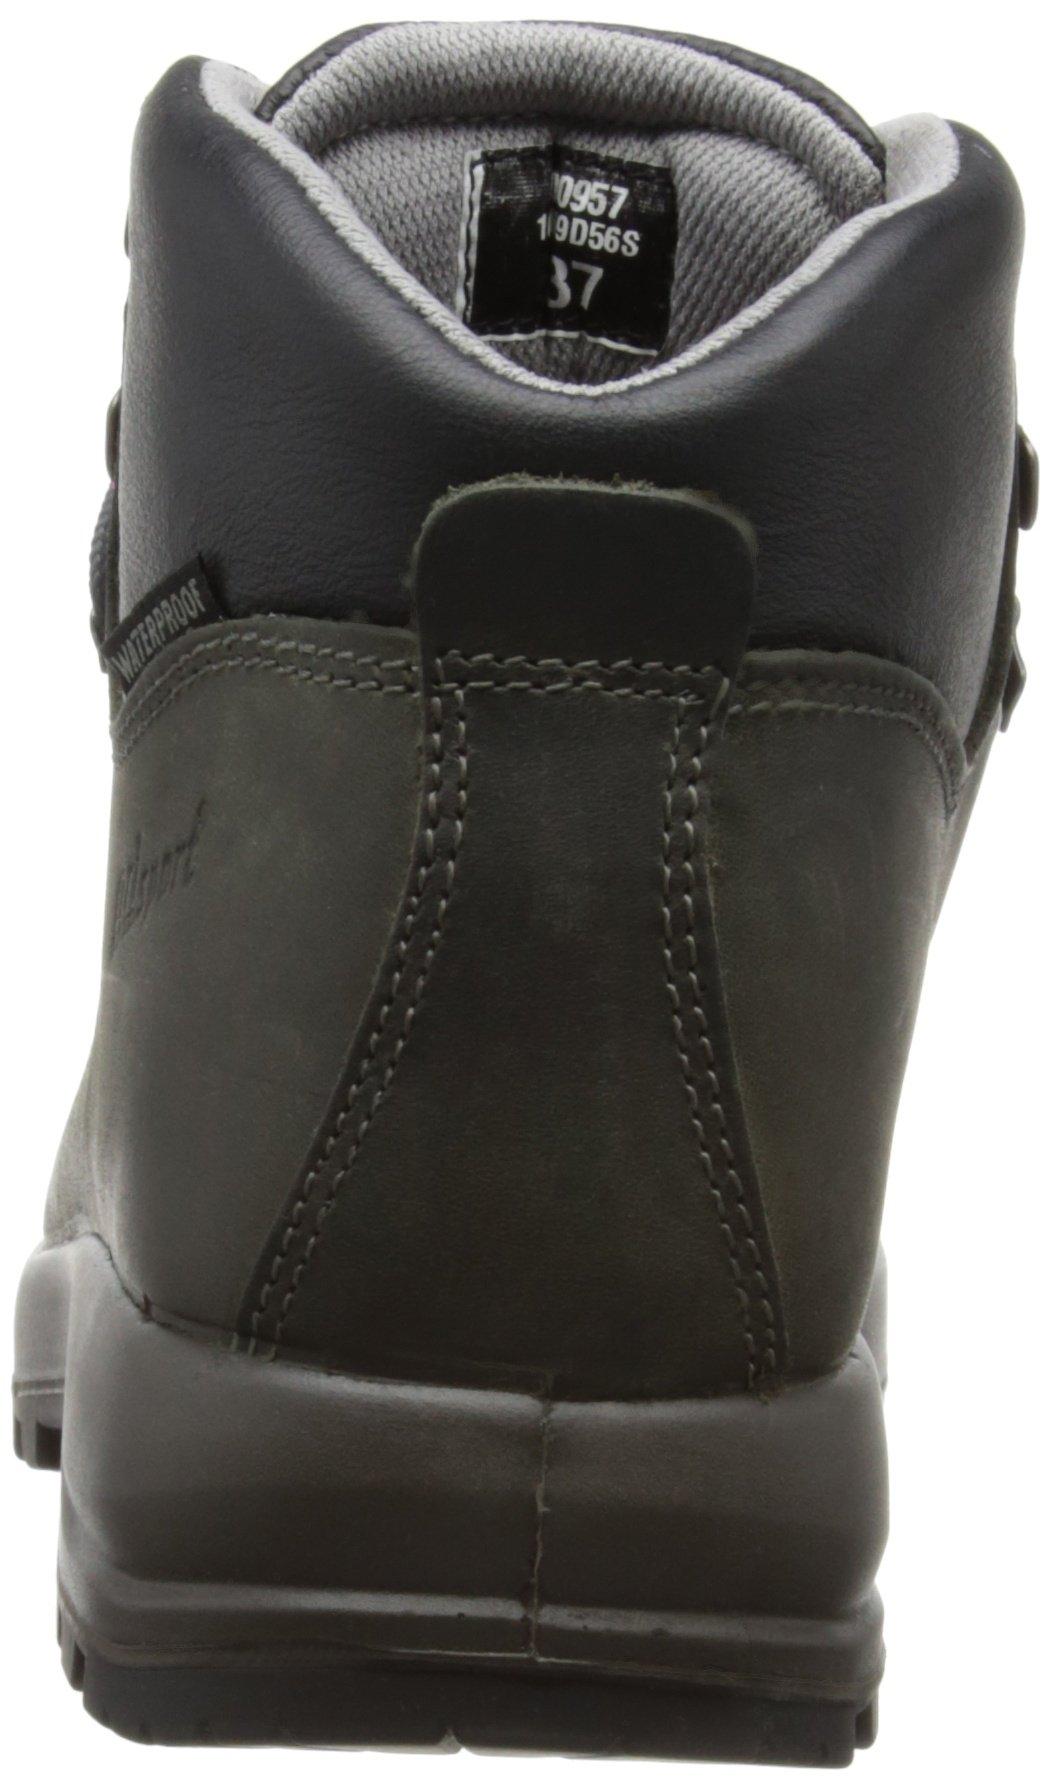 3e33135dca5 Grisport Women's Hurricane Hiking Shoes - UKsportsOutdoors